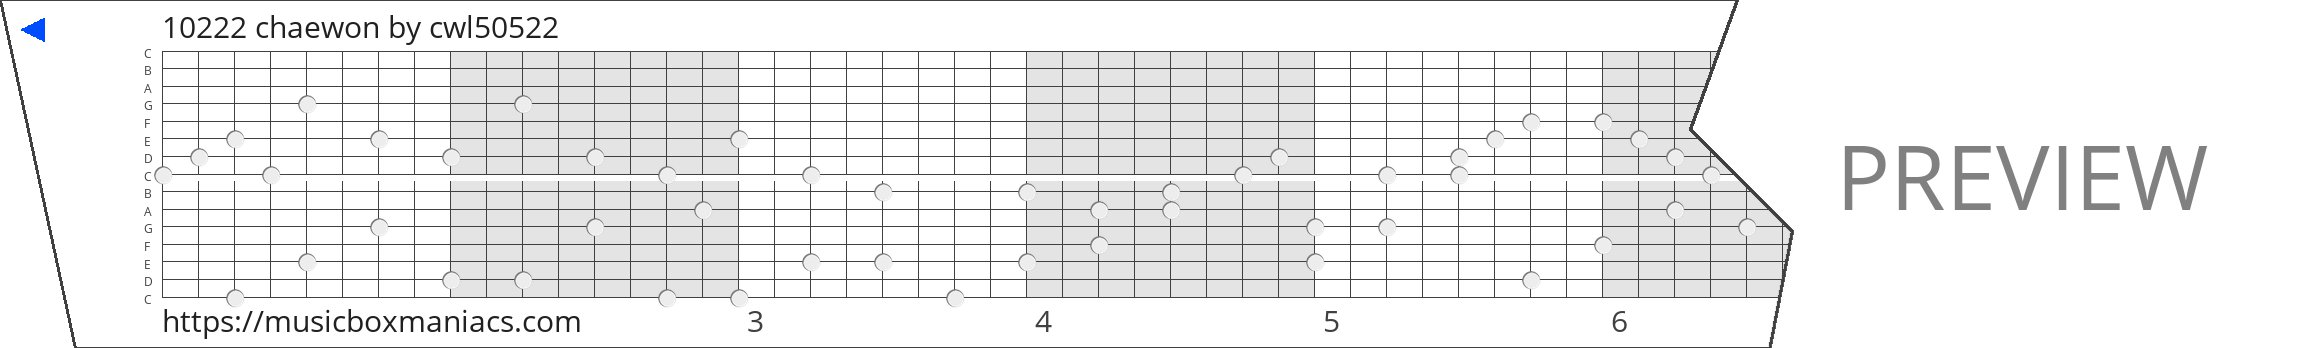 10222 chaewon 15 note music box paper strip